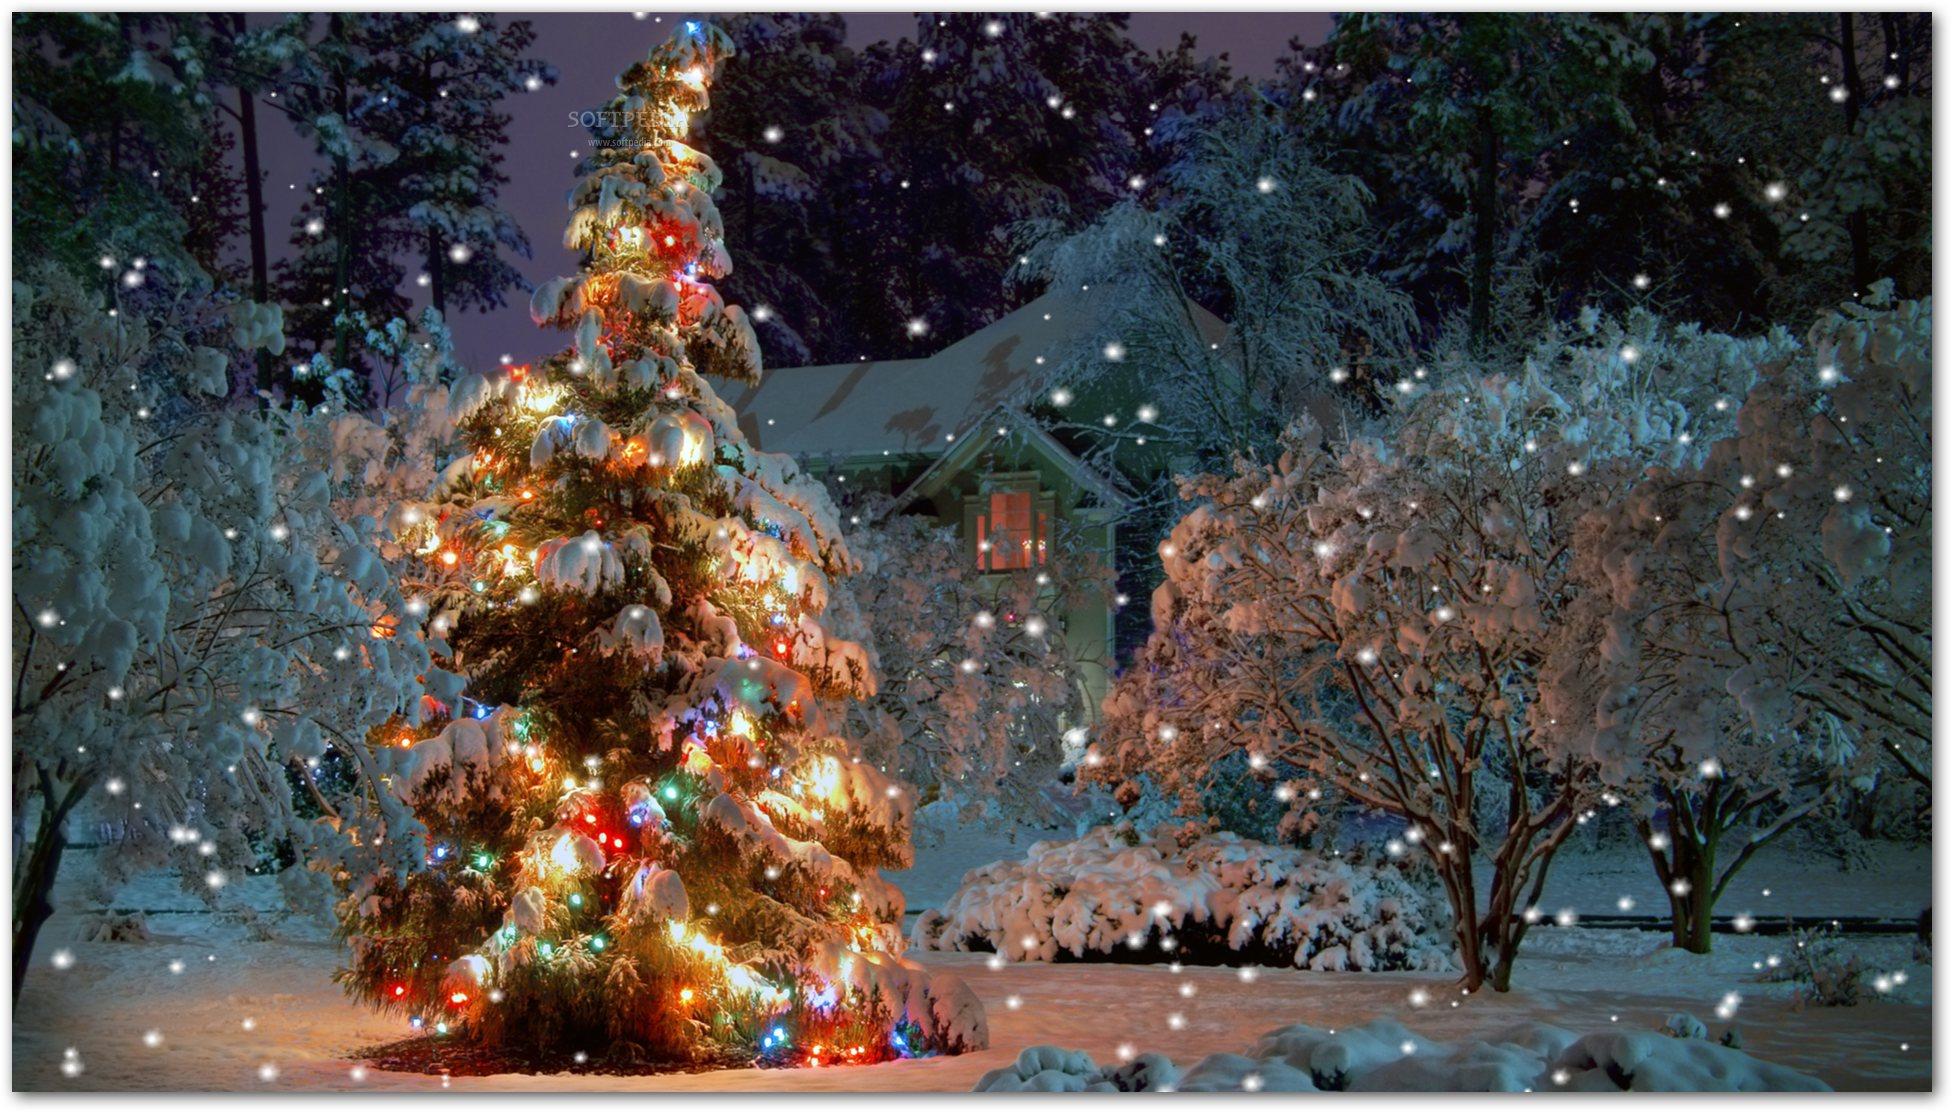 Christmas Serenity Screensaver Download 1952x1112